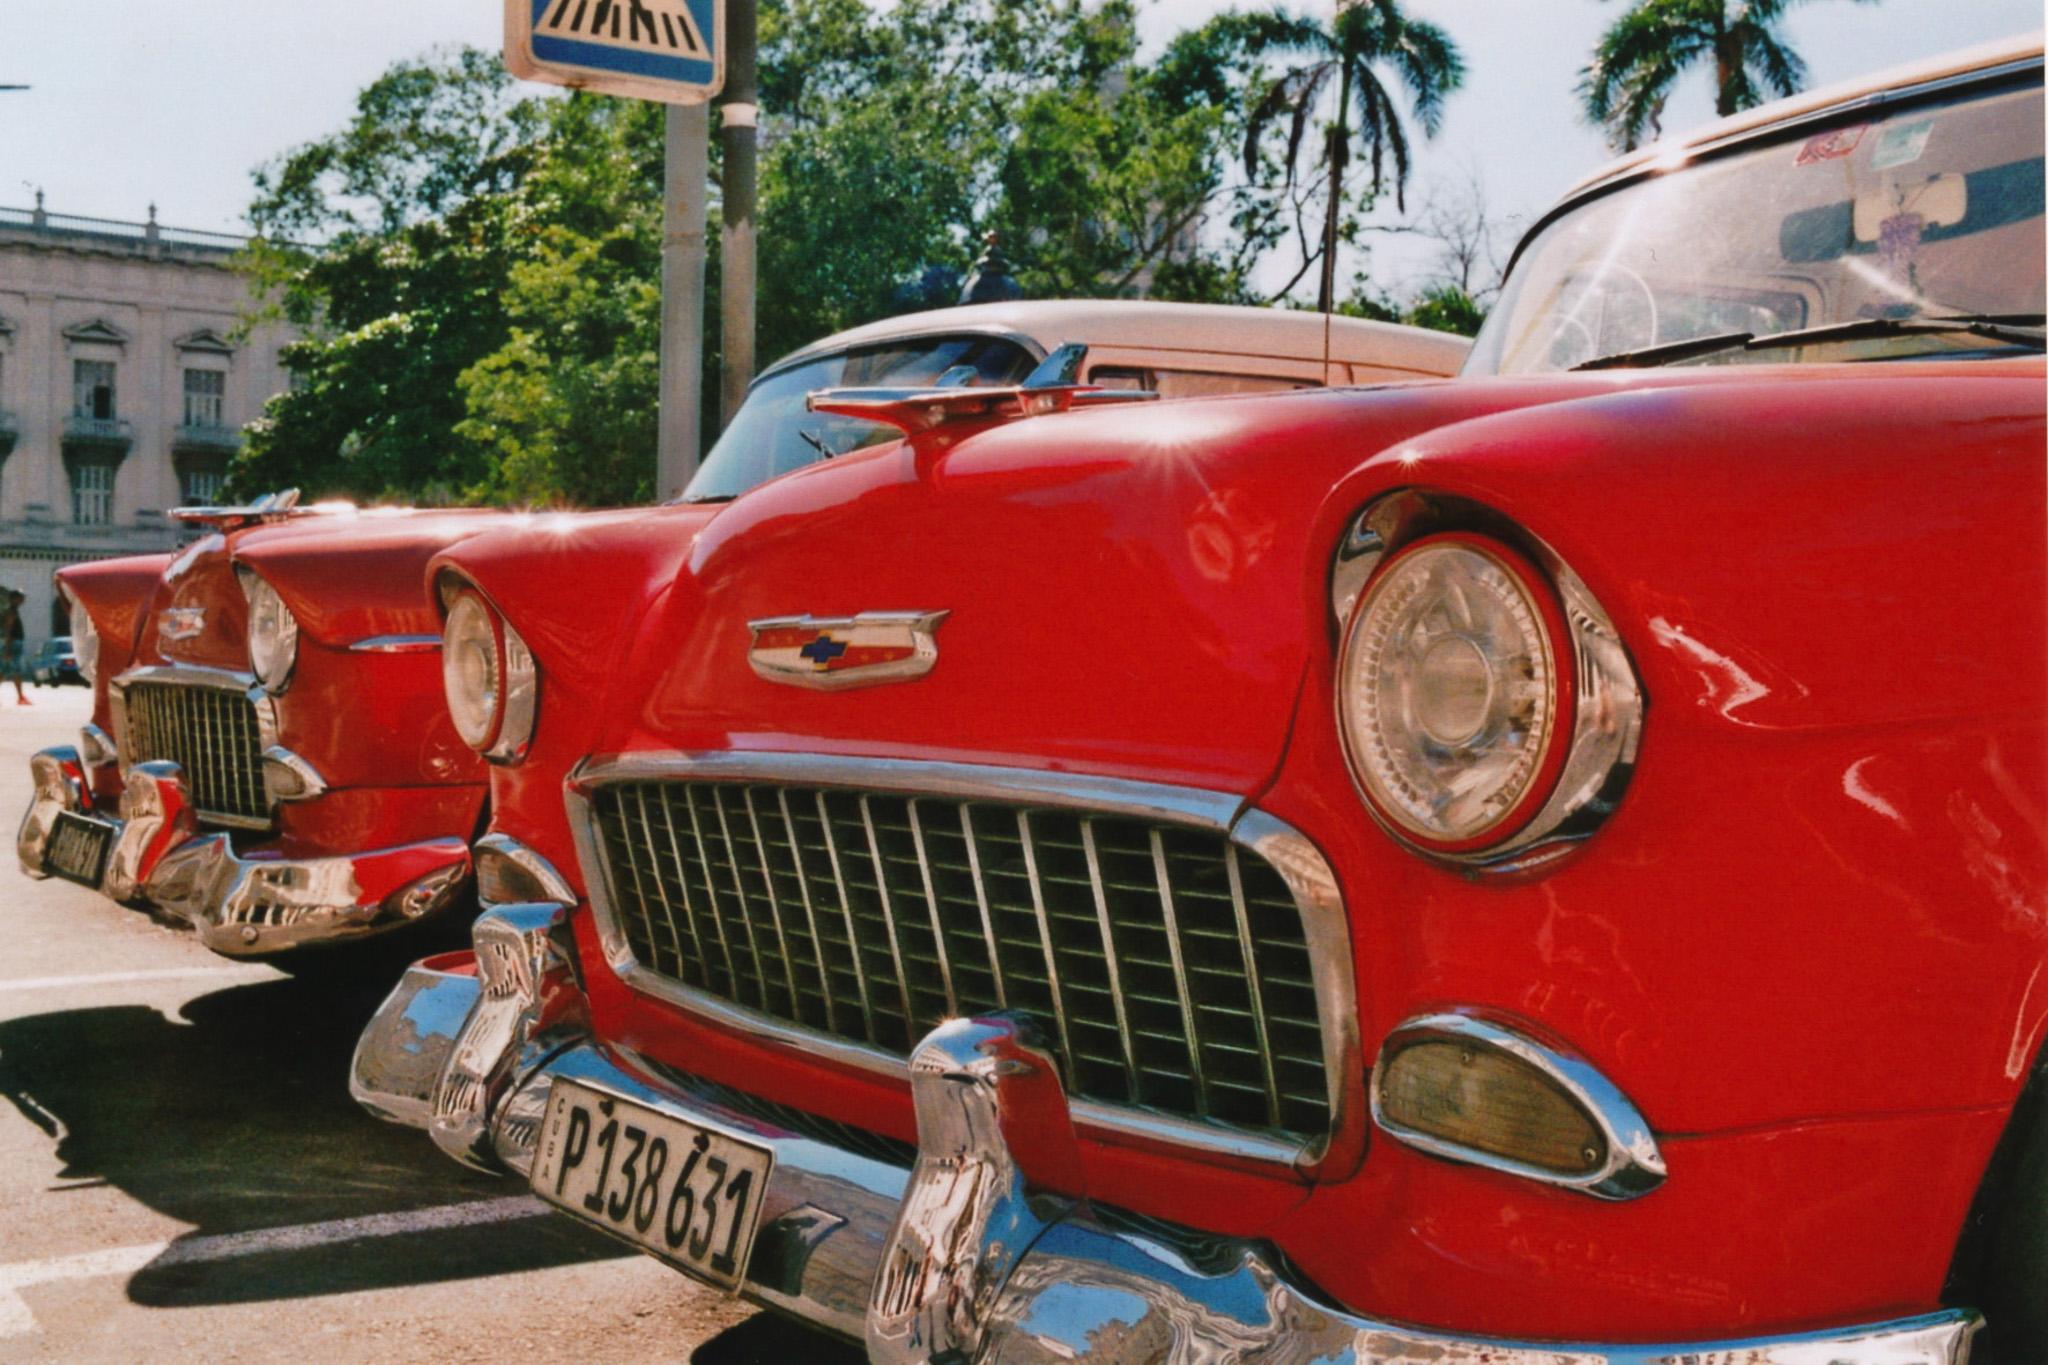 Kuba-2017-12-Analog-048.jpg